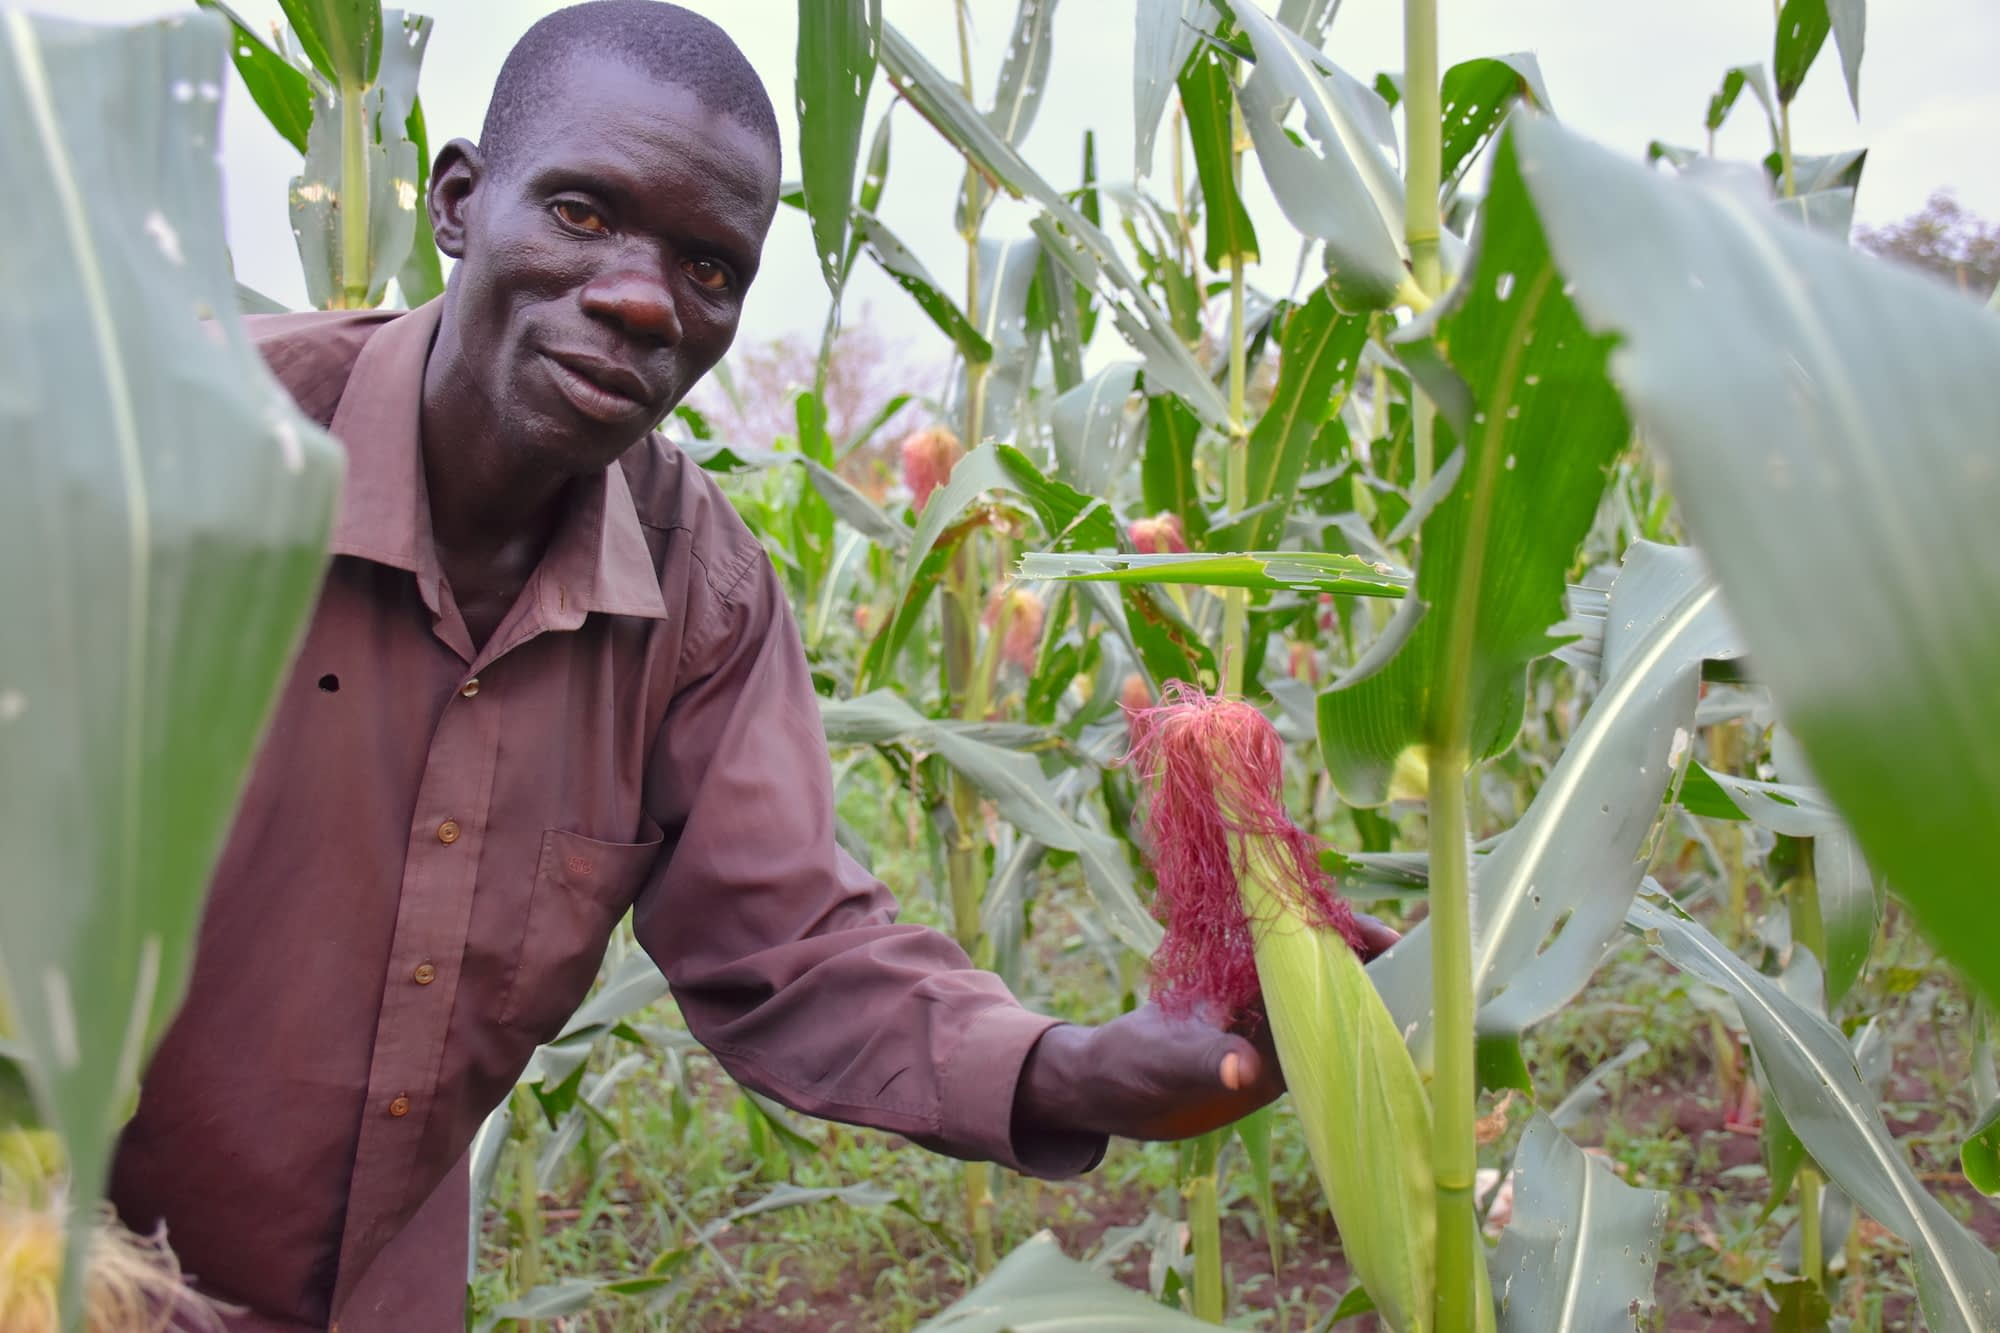 Geoffrey Ochieng', a smallholder farmer from northern Uganda. He plants the UH5051 variety on his land. (Photo: Joshua Masinde/CIMMYT)